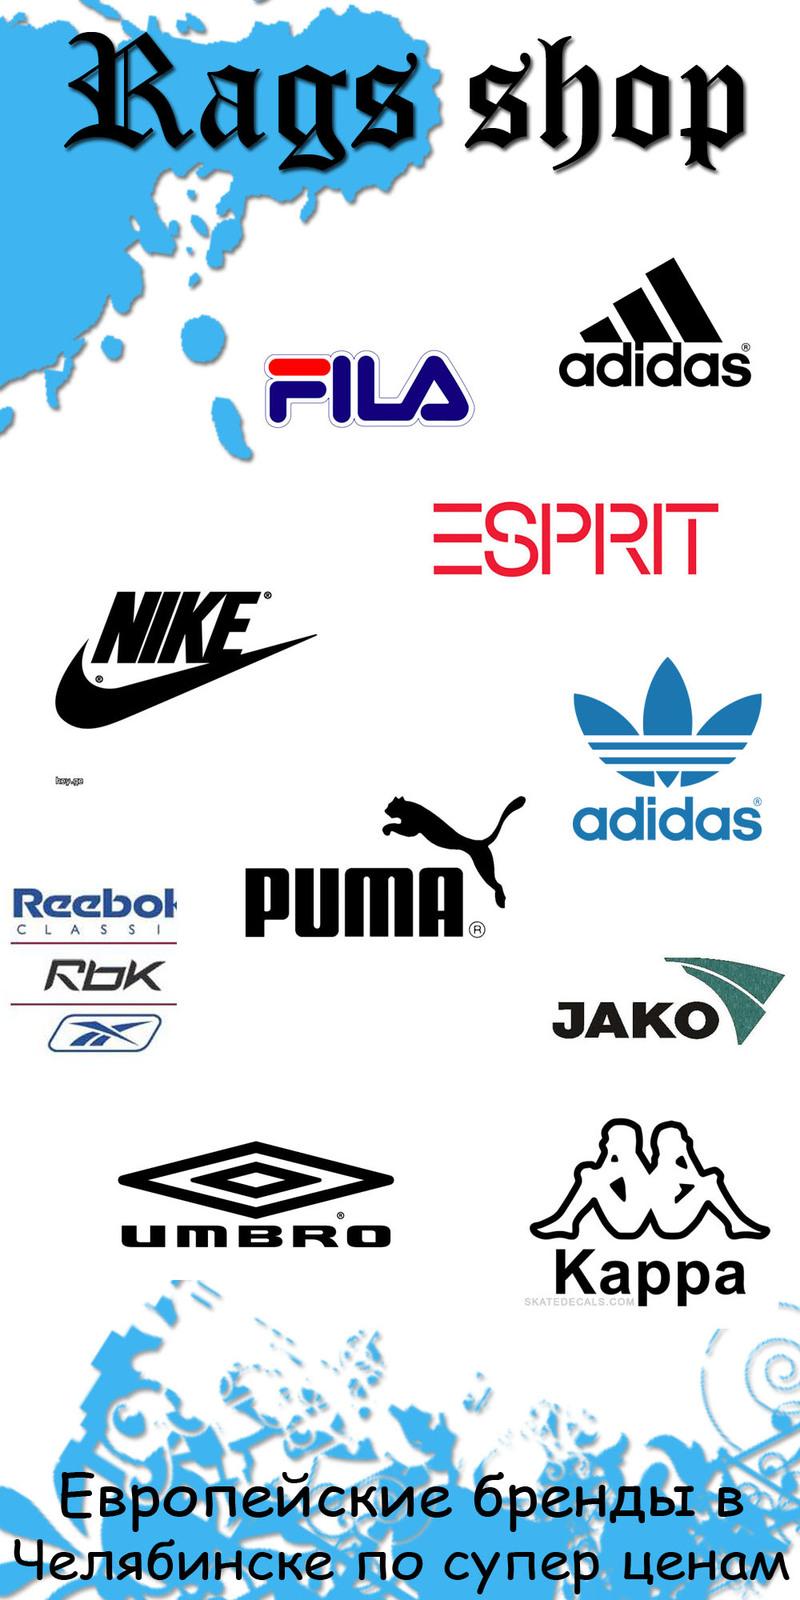 Интернет магазин лого челябинск ...: pictures11.ru/internet-magazin-logo-chelyabinsk.html